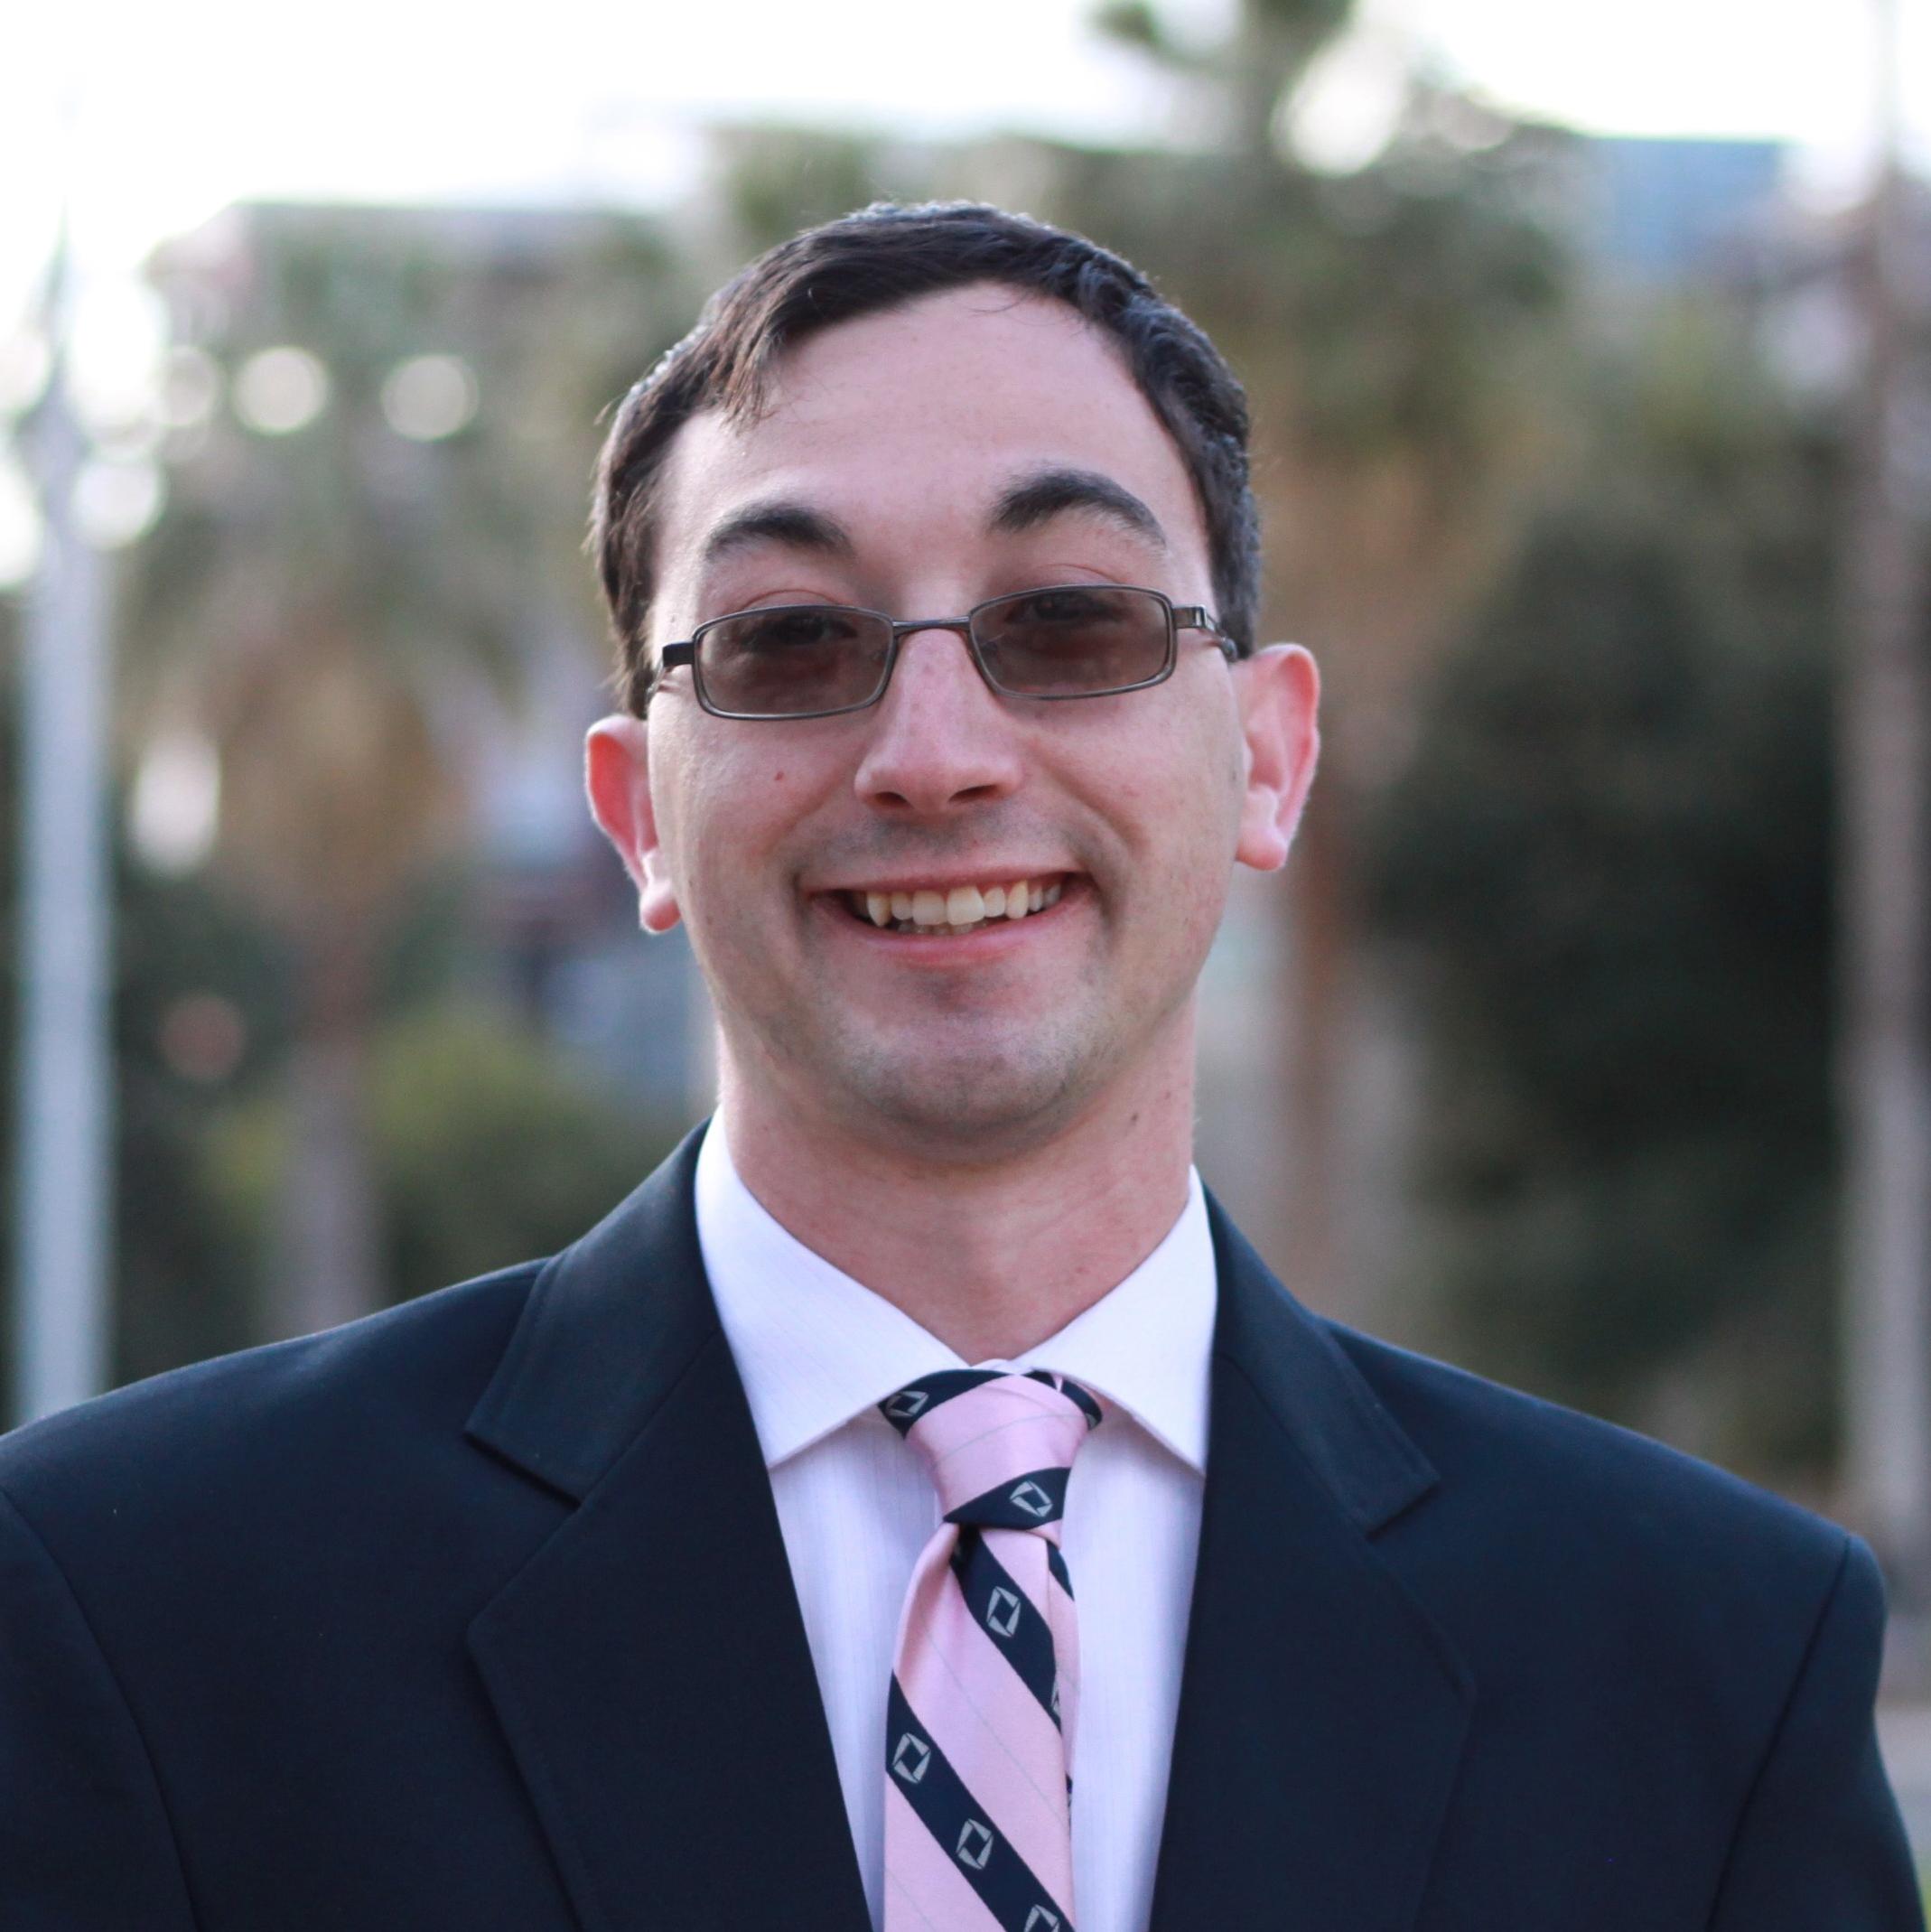 Cdeca Candidate 2020 Caleb Nochumson